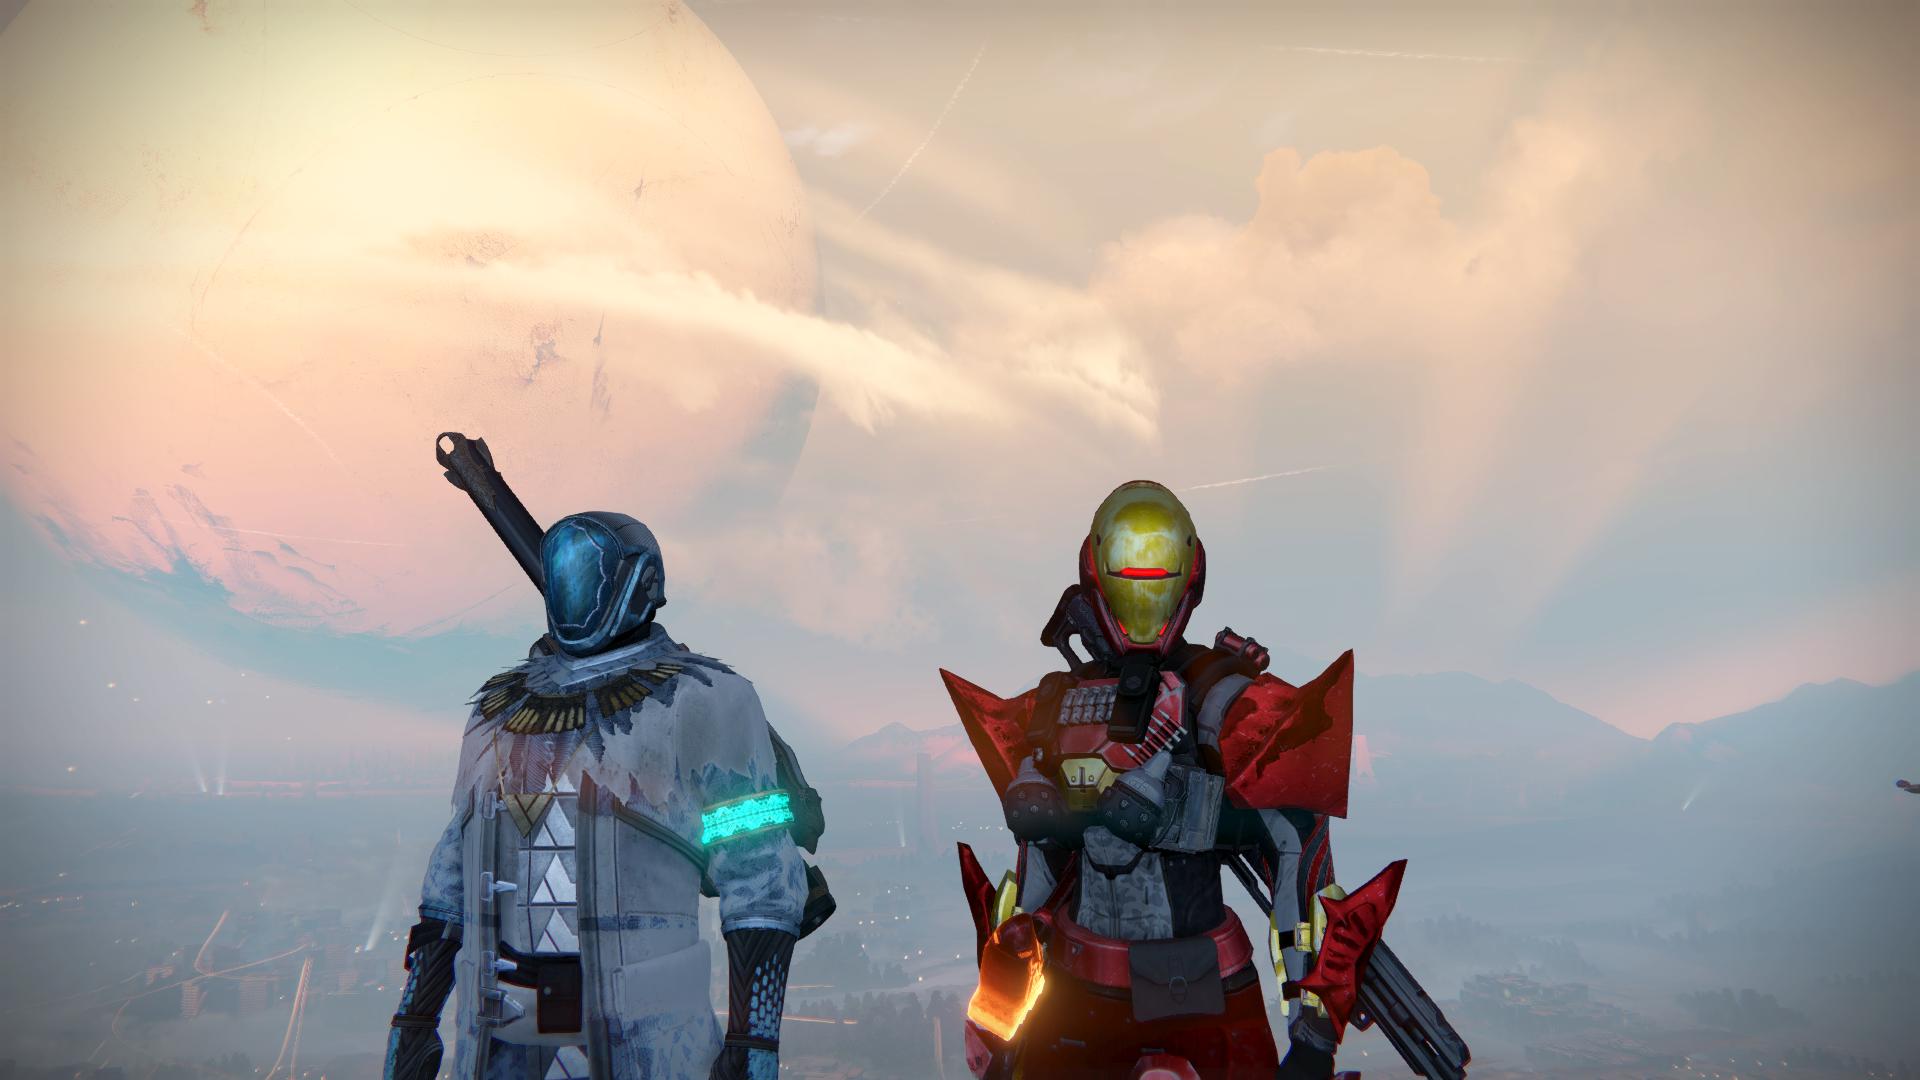 Ishtar Commander is a Destiny player's best friend (App Review)